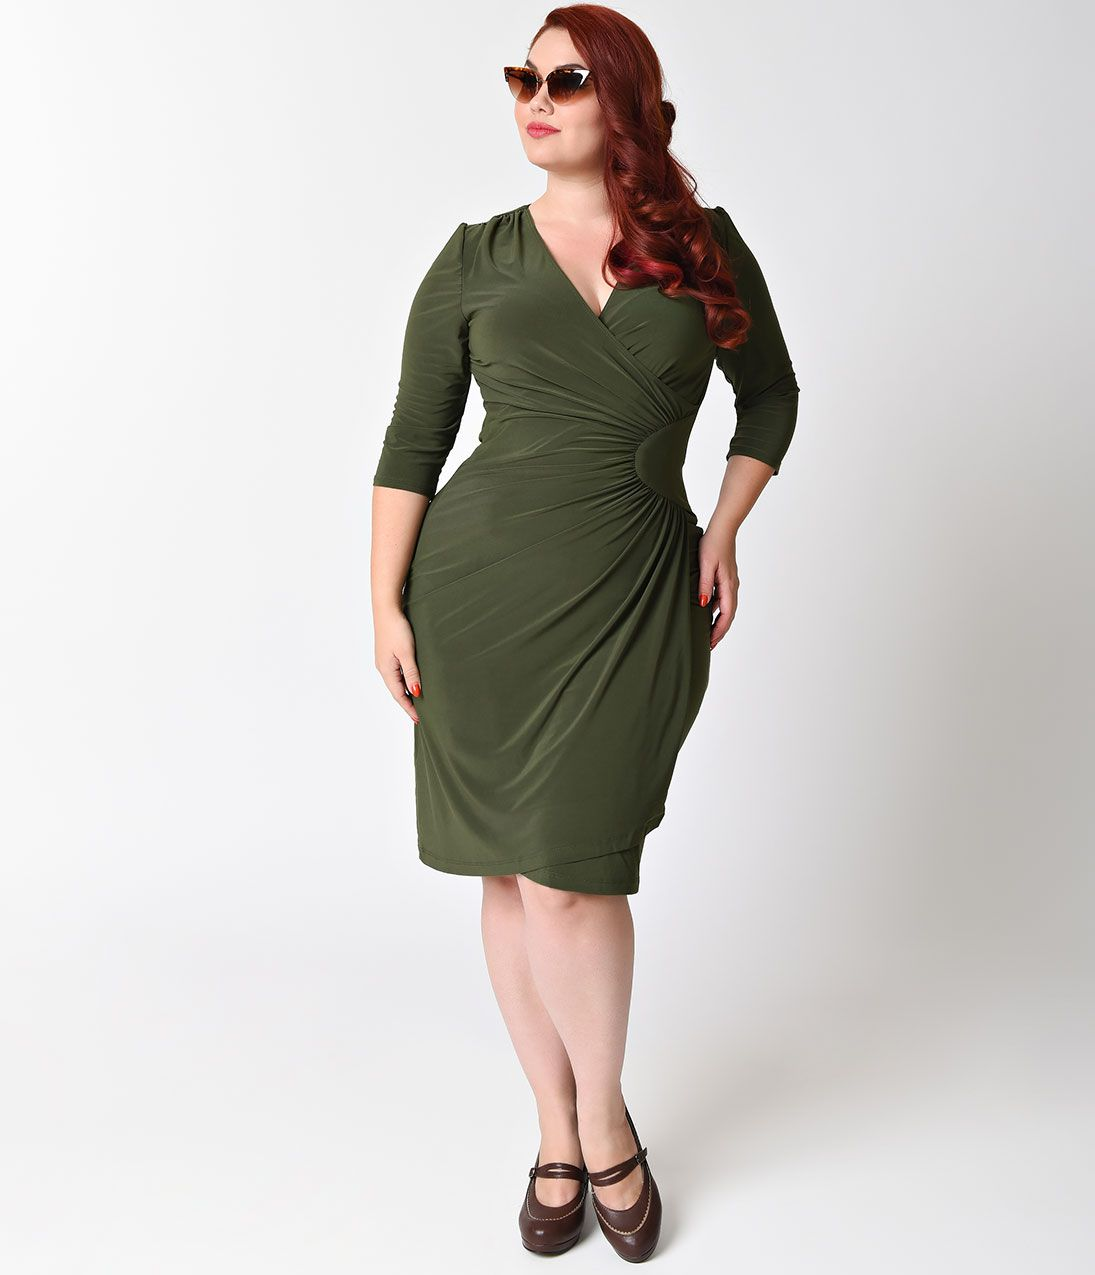 s Dress ideas and Quarter sleeve